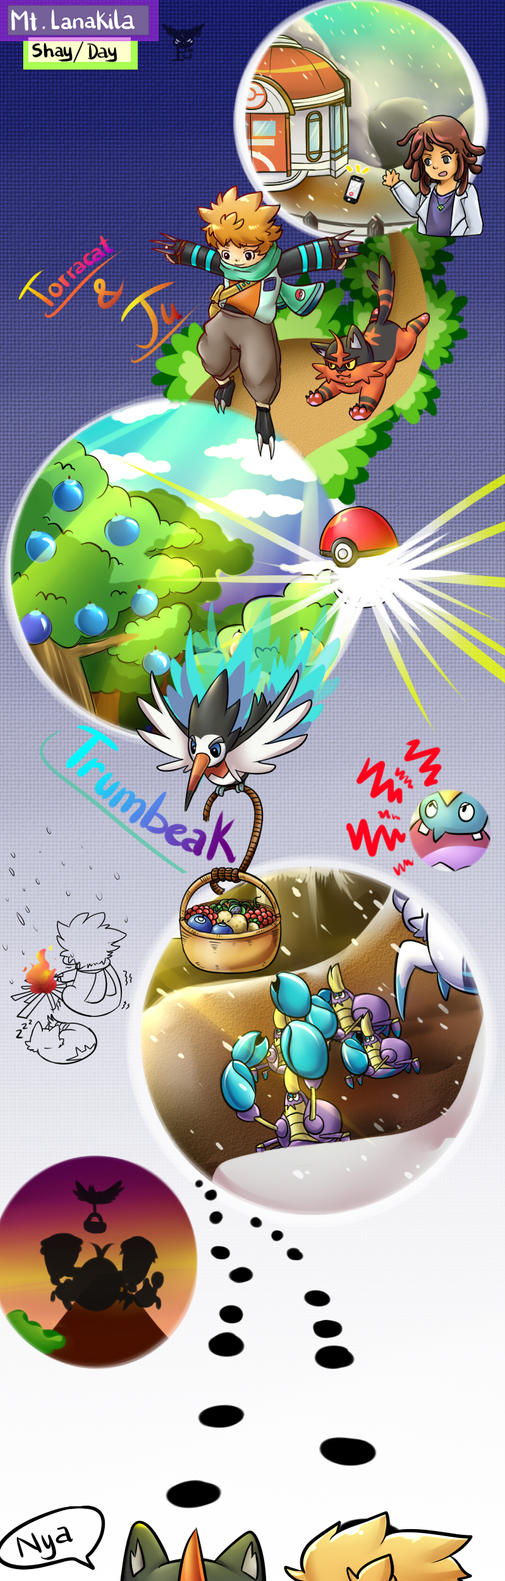 Pokemon rescue by MinhPuPu